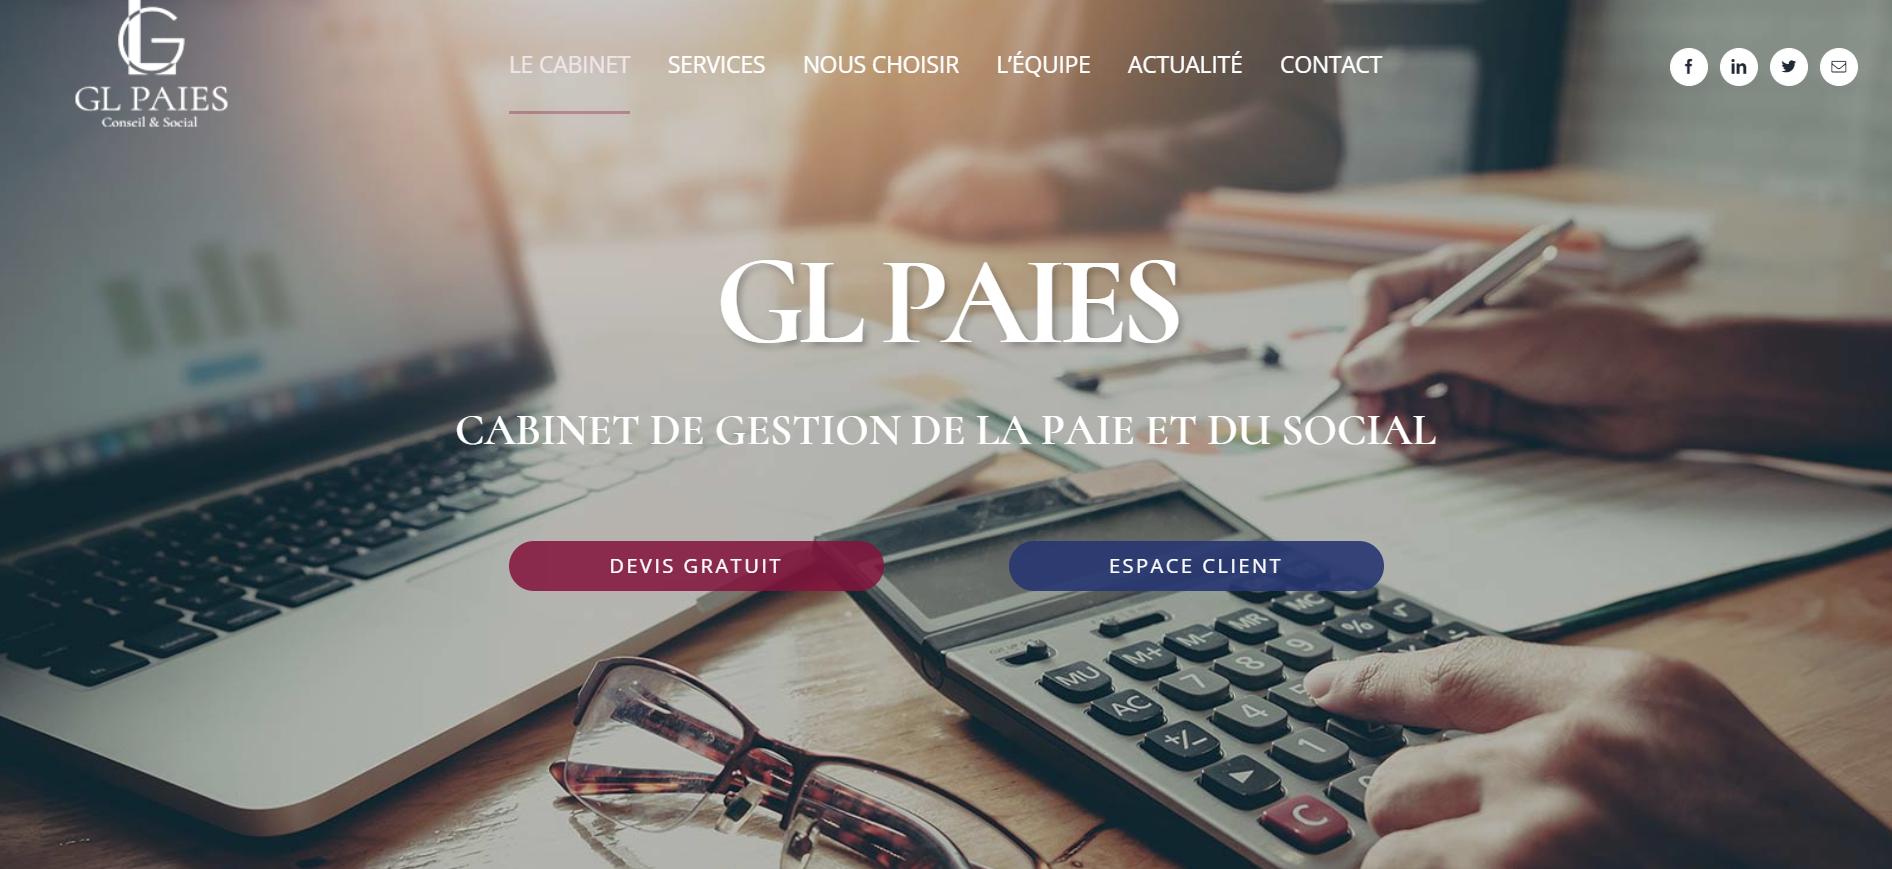 Site internet gl paies